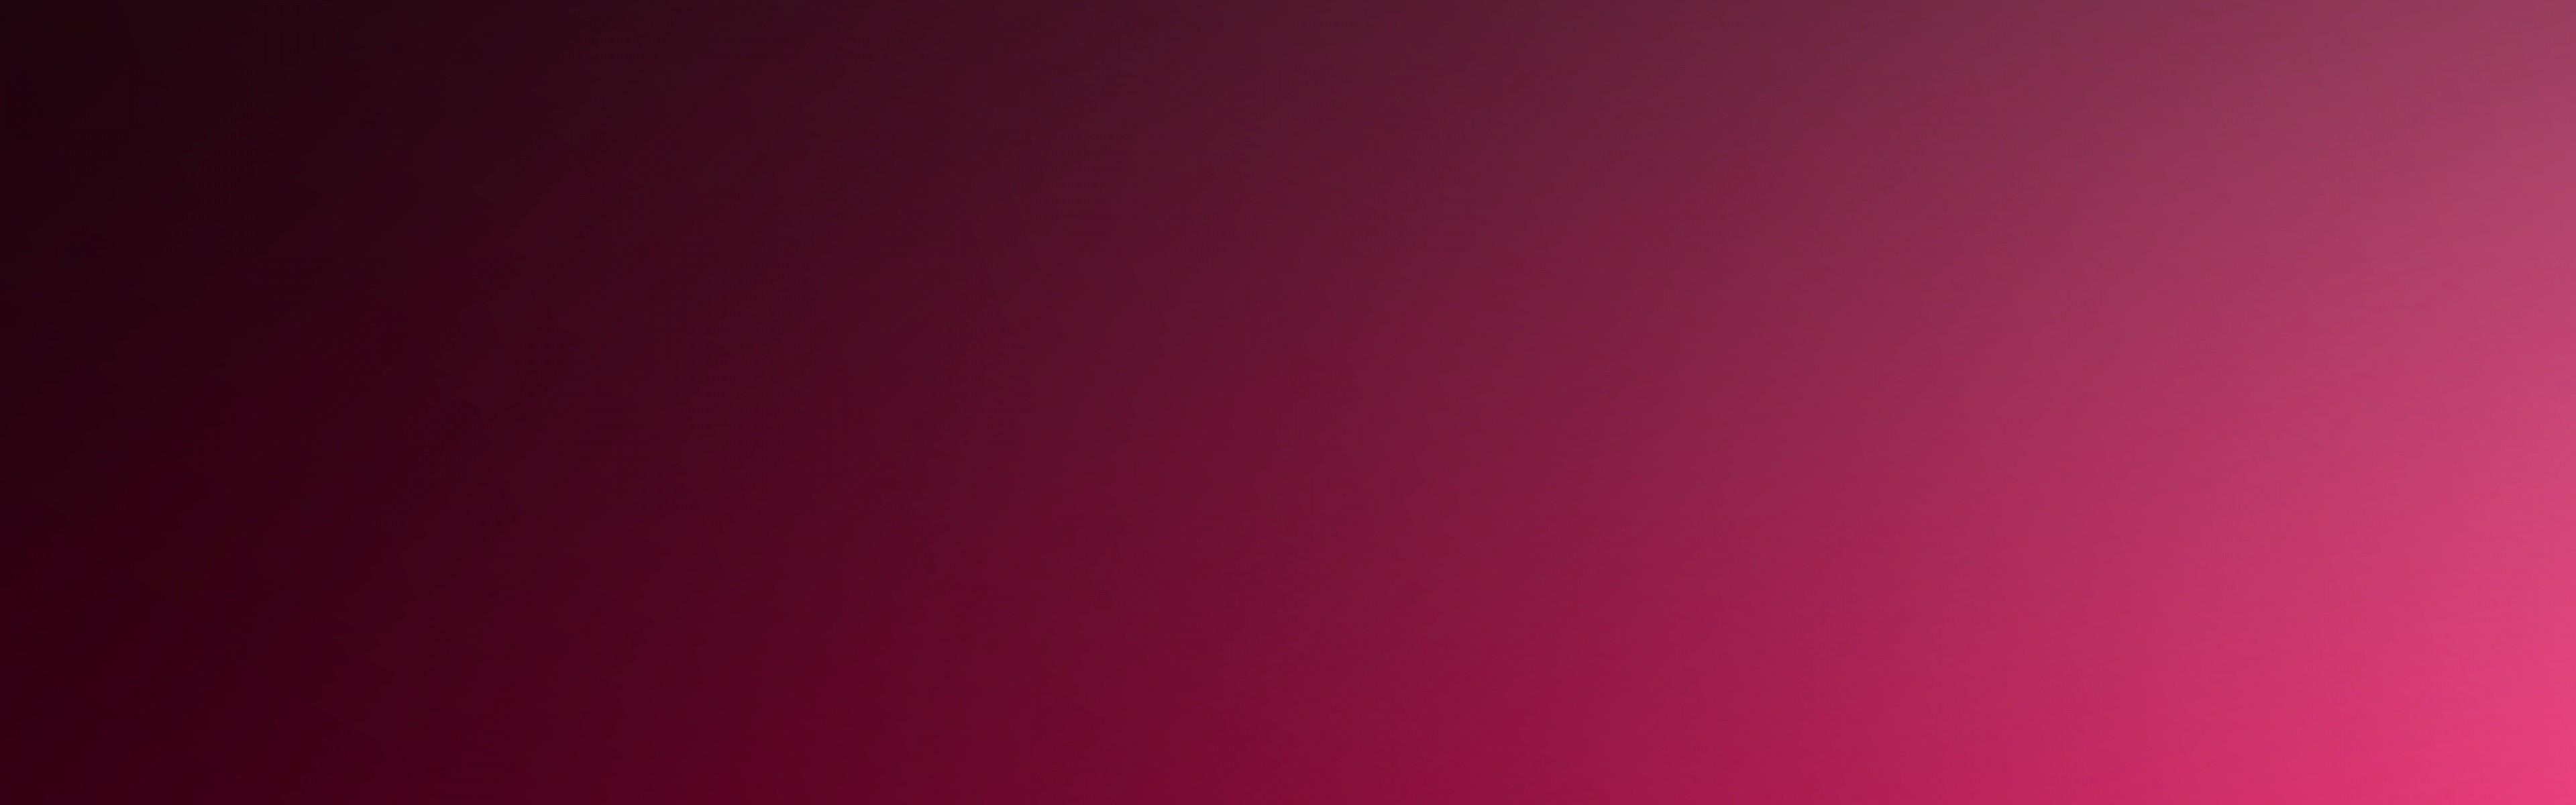 Wallpaper pink, background, shadows, light